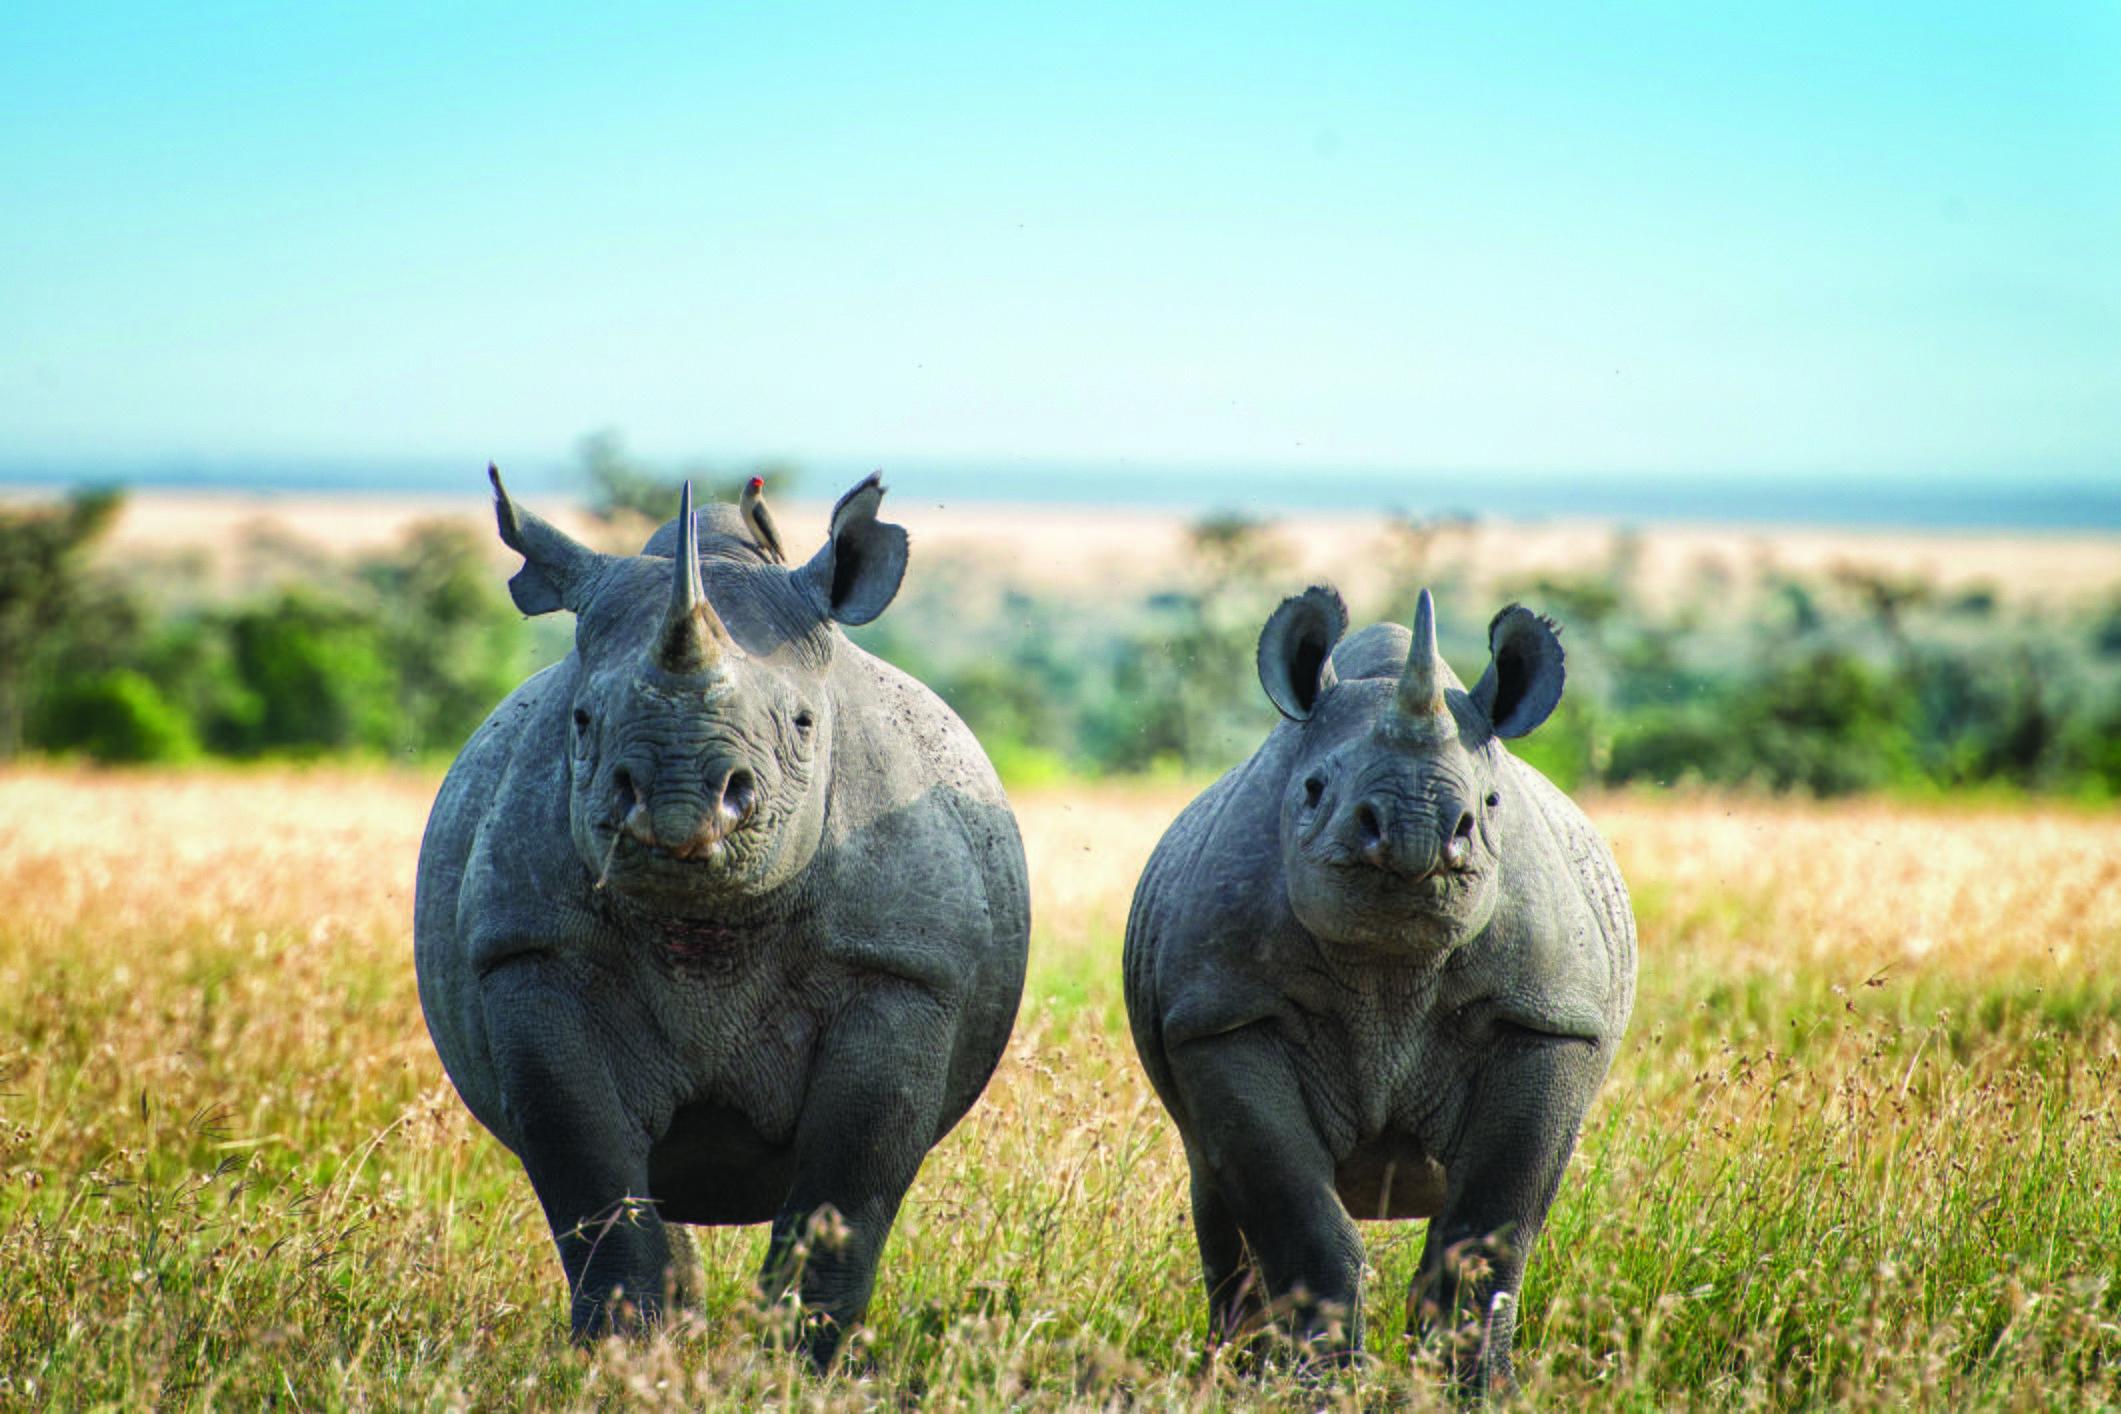 Black rhino and older calf